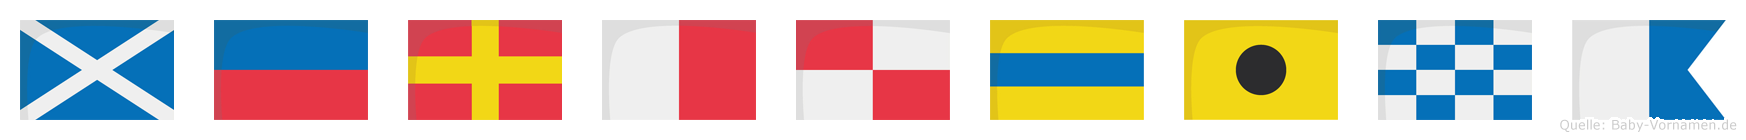 Merhudina im Flaggenalphabet